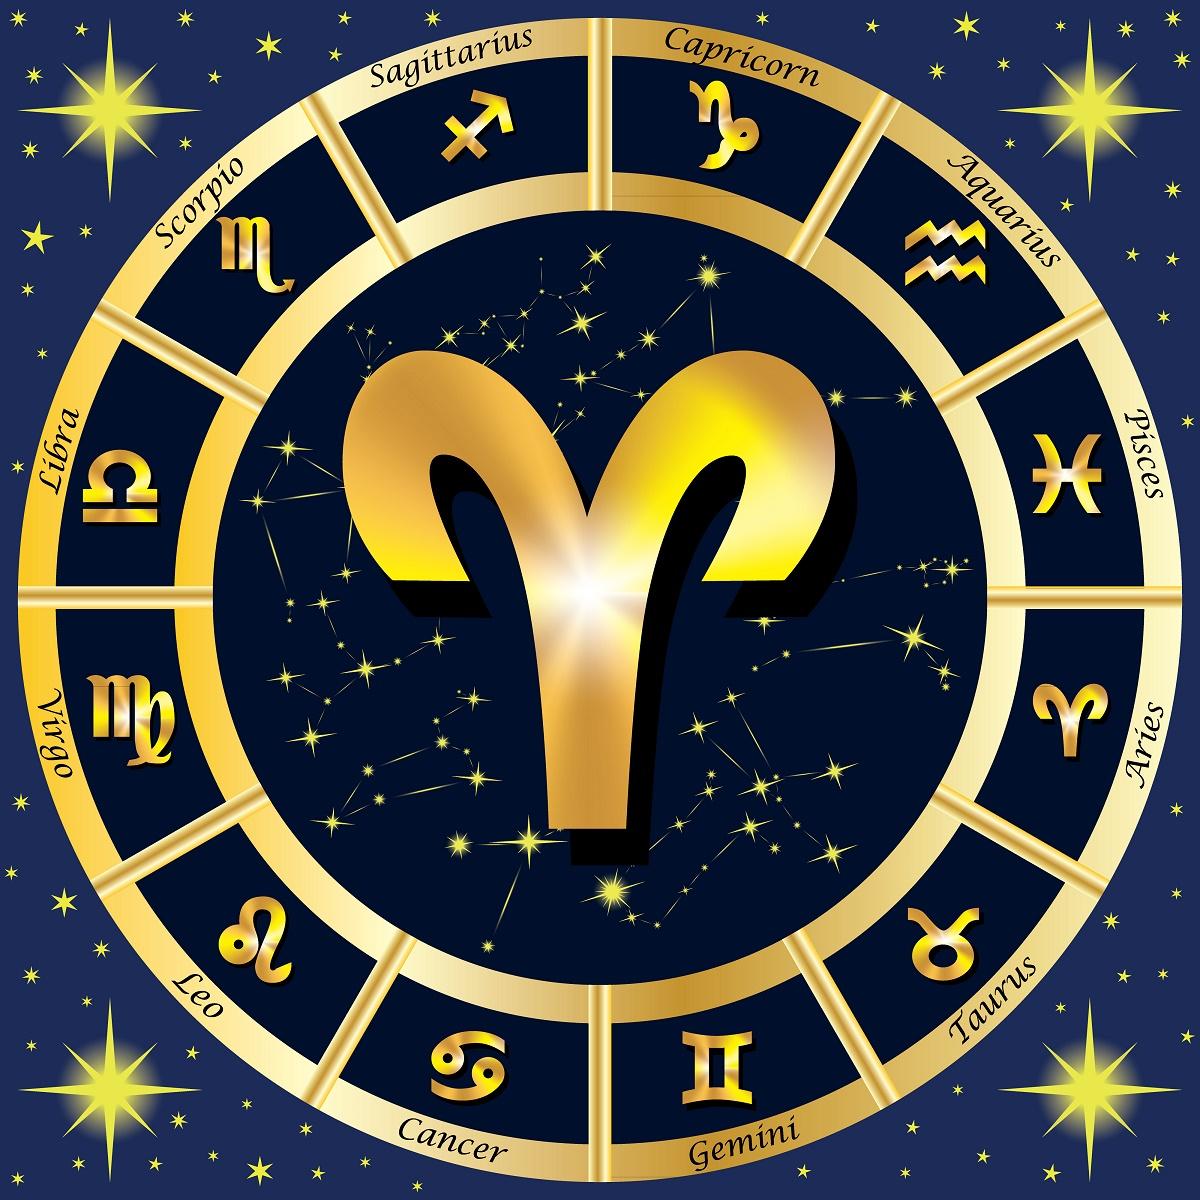 Horoscop săptămânal 23-29 octombrie 2017 Berbec - Oana Hanganu